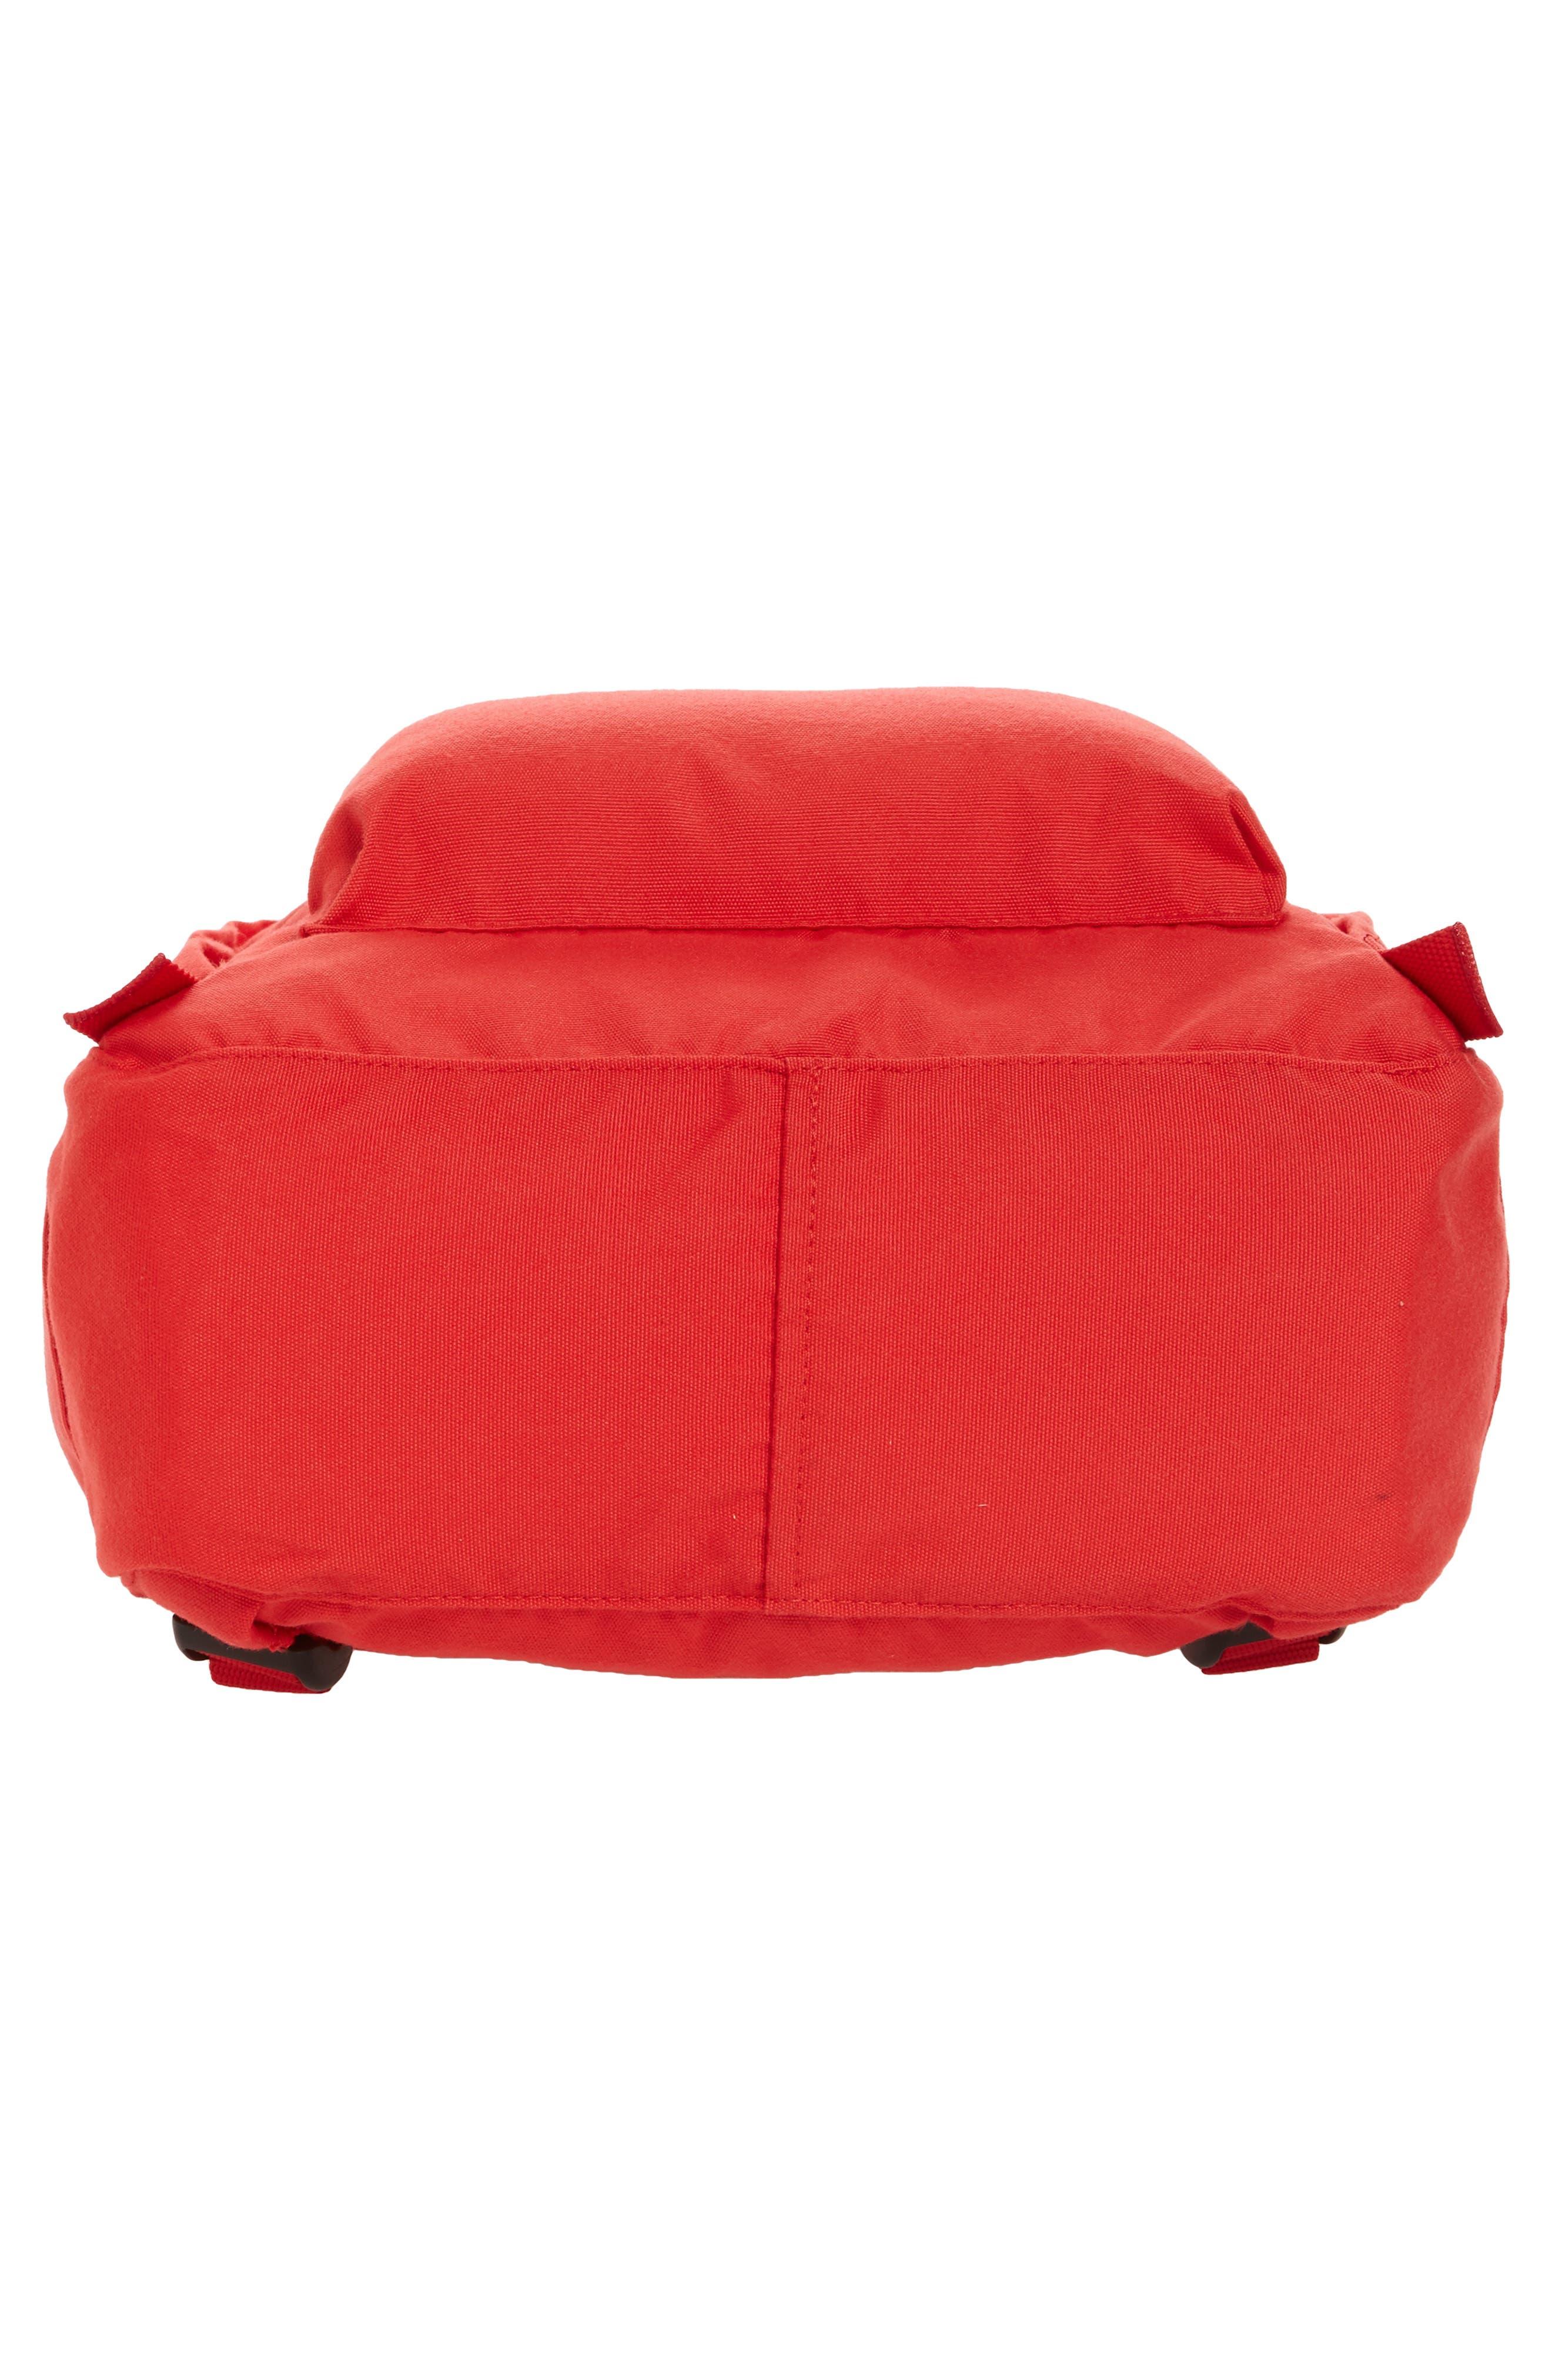 Re-Kånken Water Resistant Backpack,                             Alternate thumbnail 6, color,                             Red